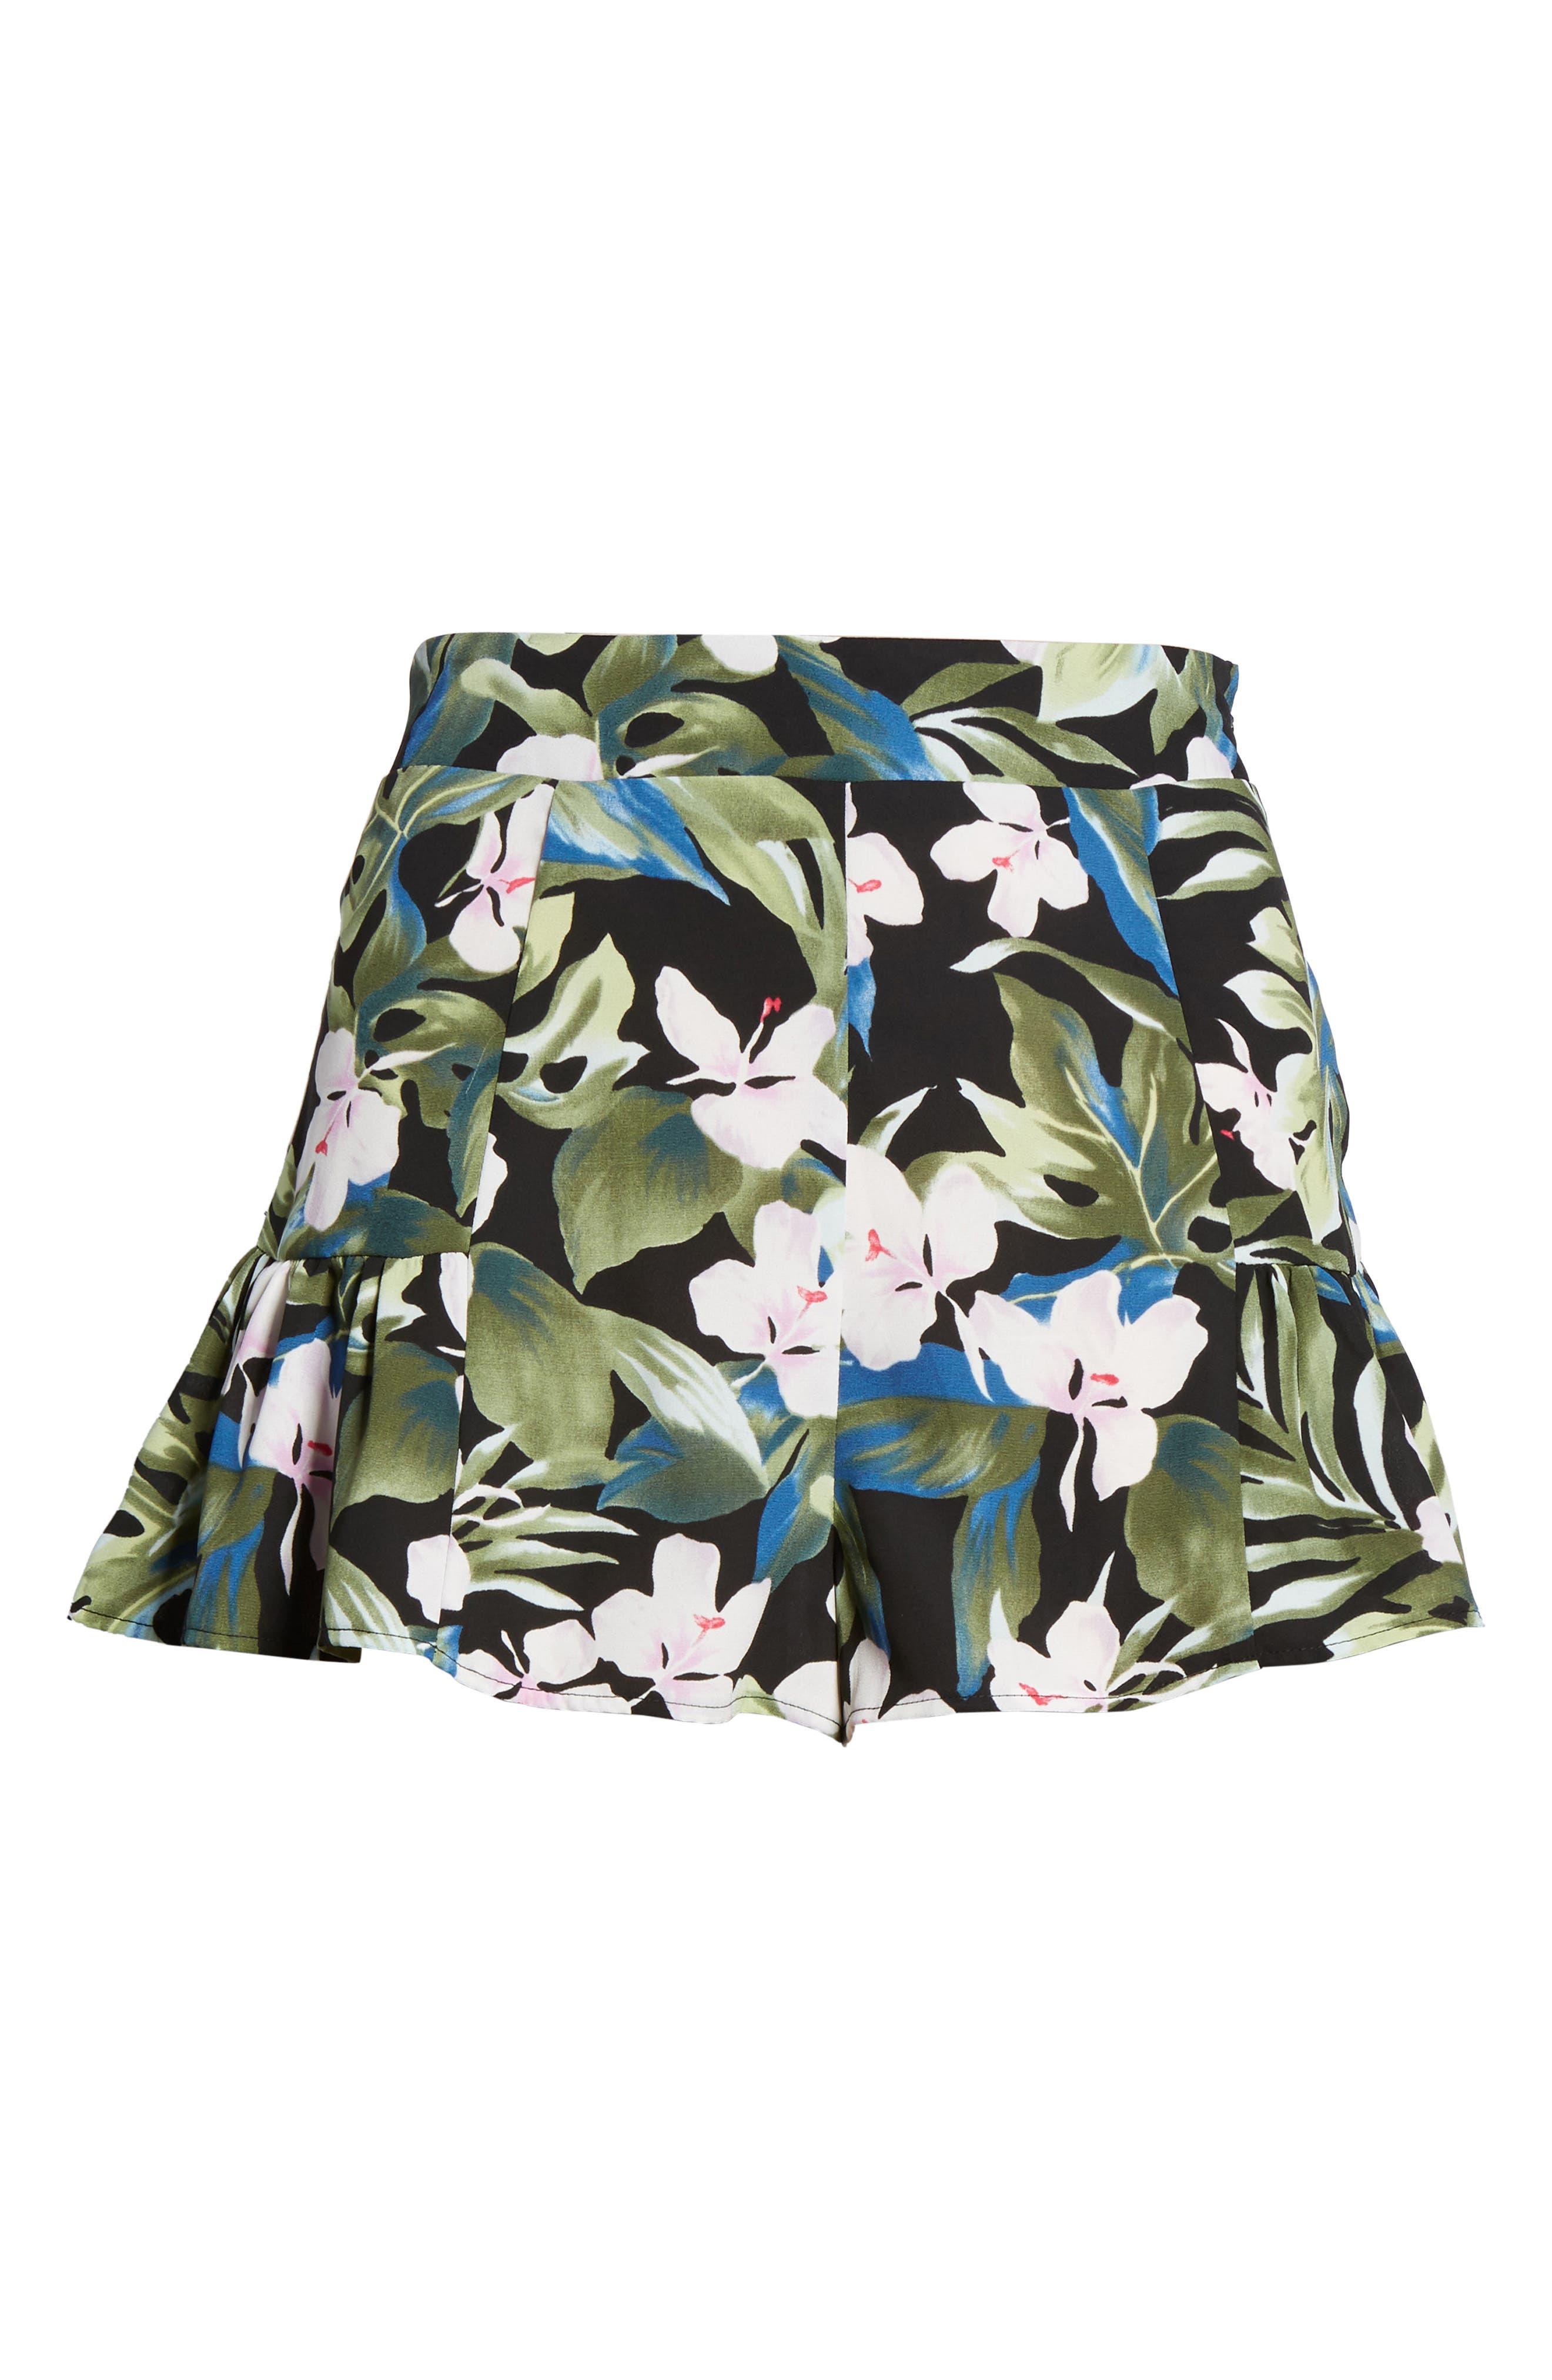 Skippy Shorts,                             Alternate thumbnail 6, color,                             300